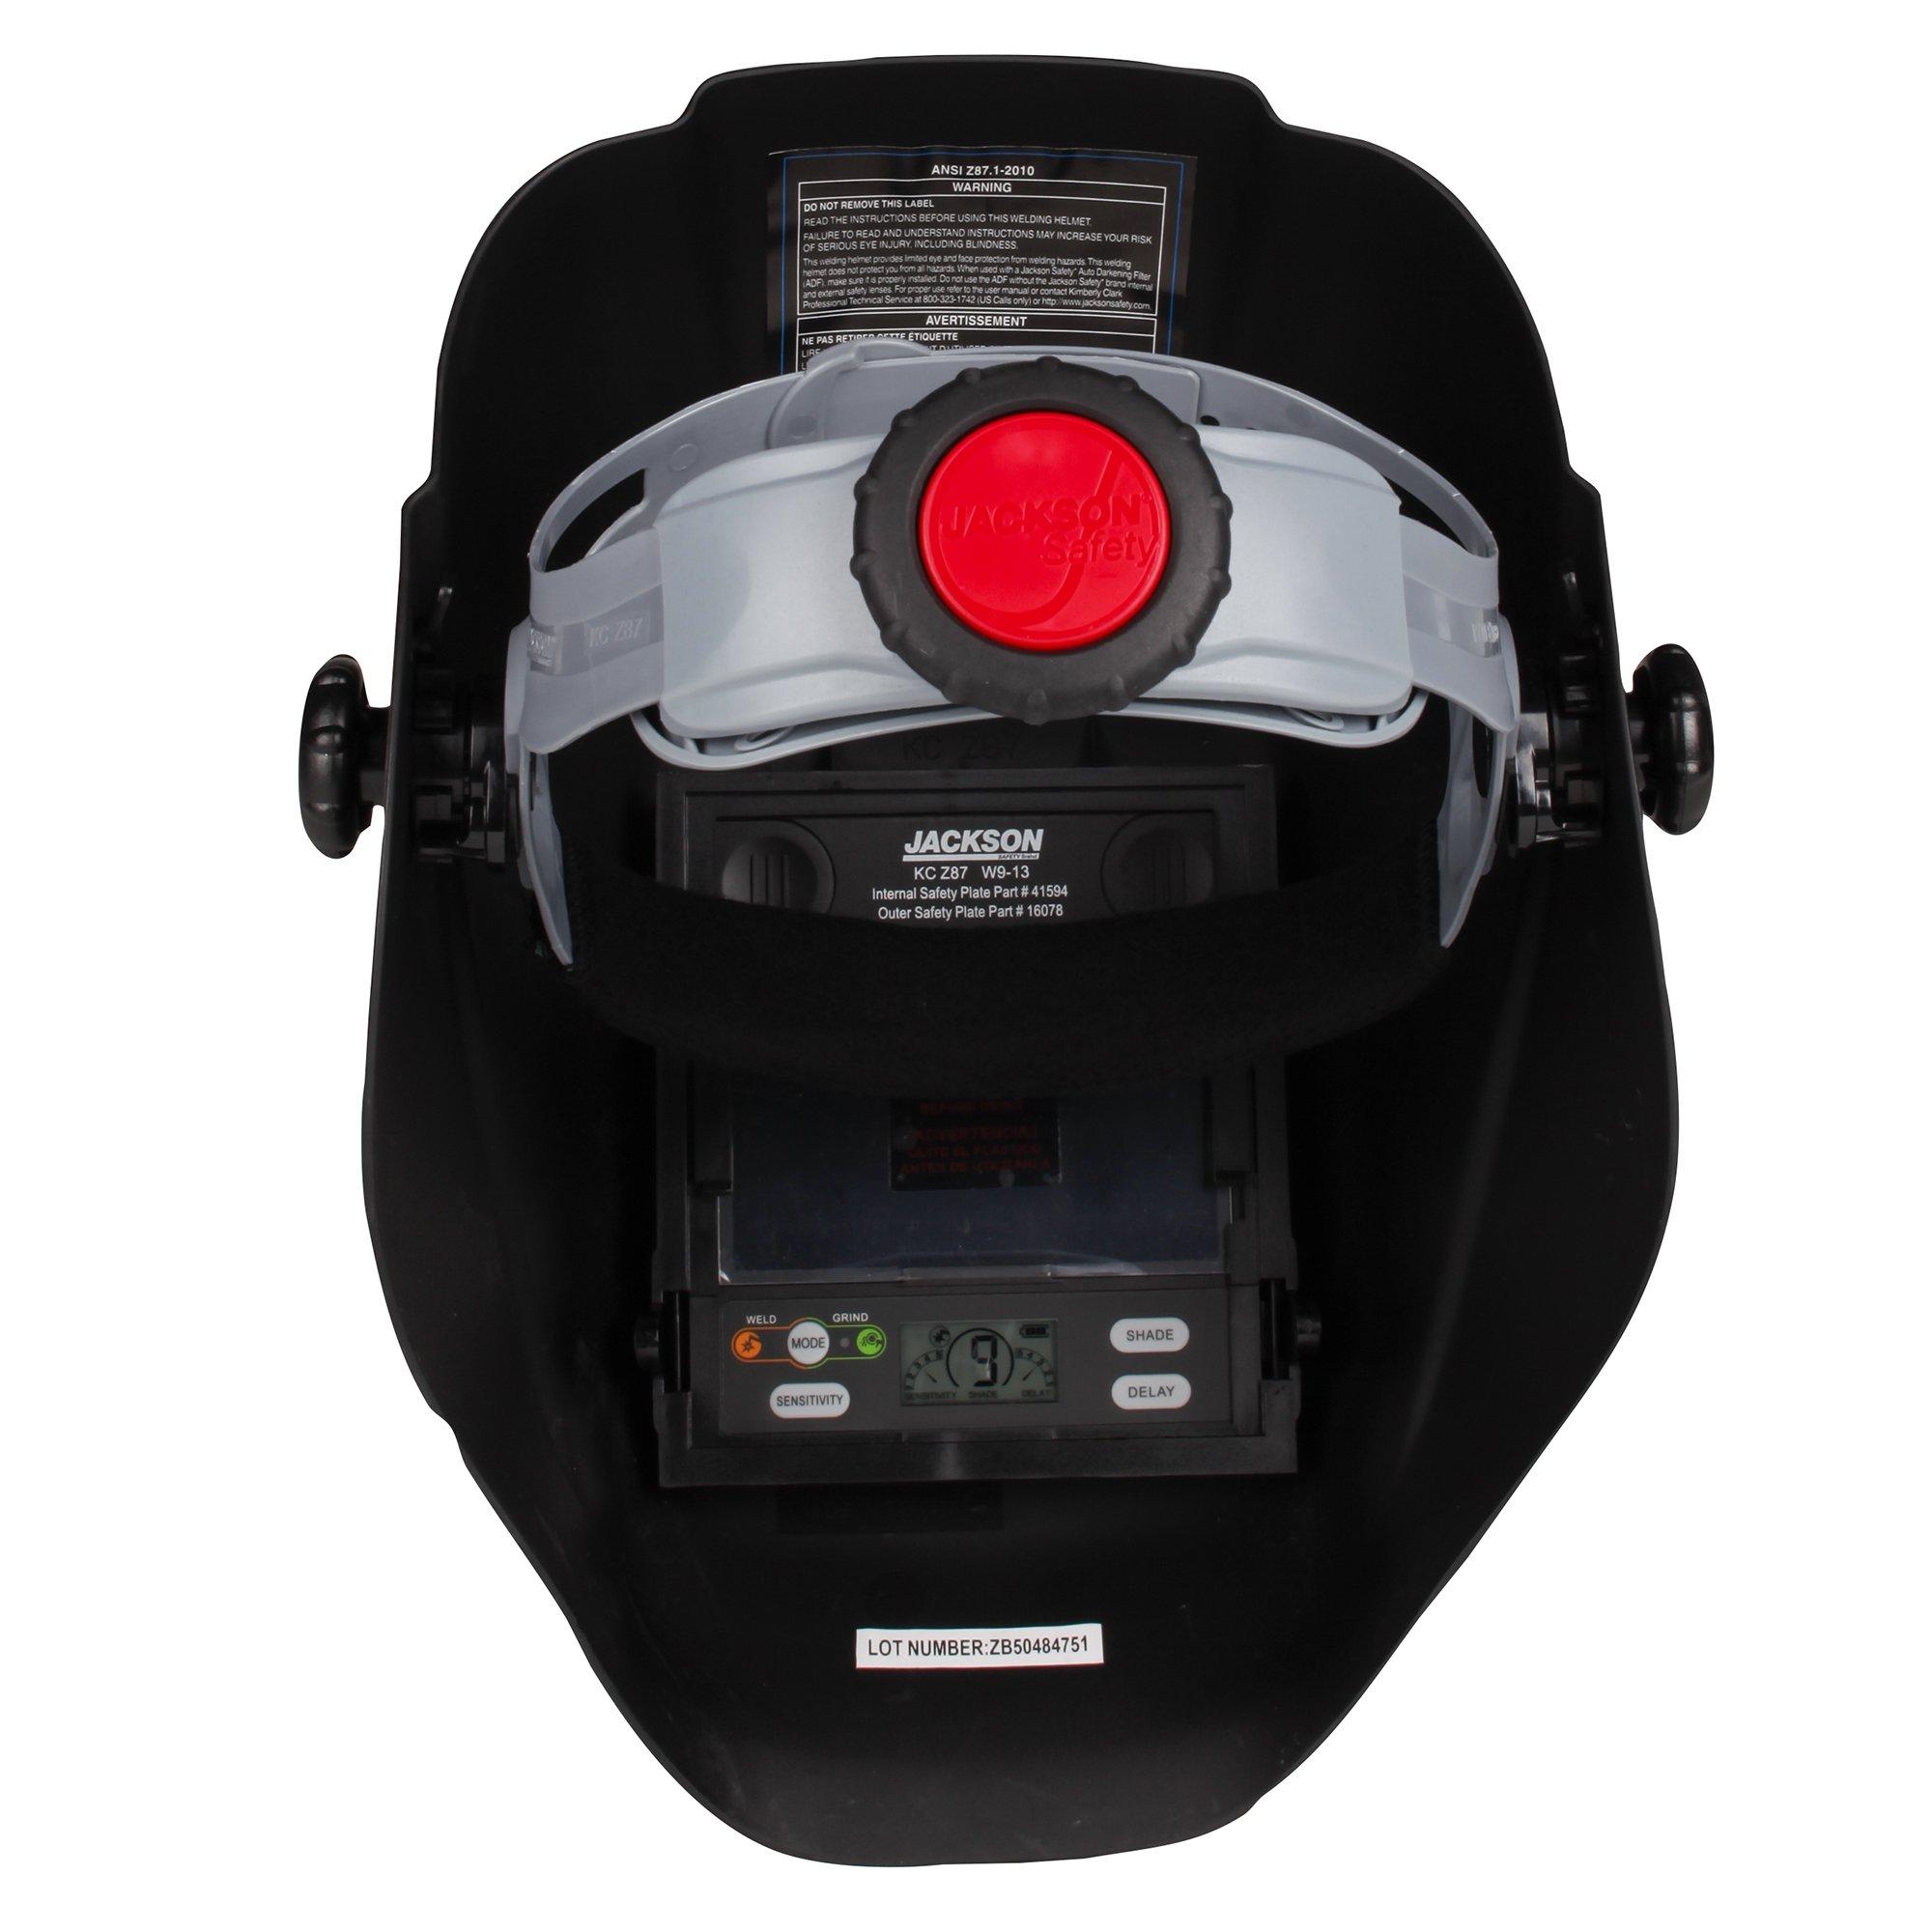 Jackson Safety 46131 Insight Variable Auto Darkening Welding Helmet, HaloX ,Black by Jackson Safety (Image #5)